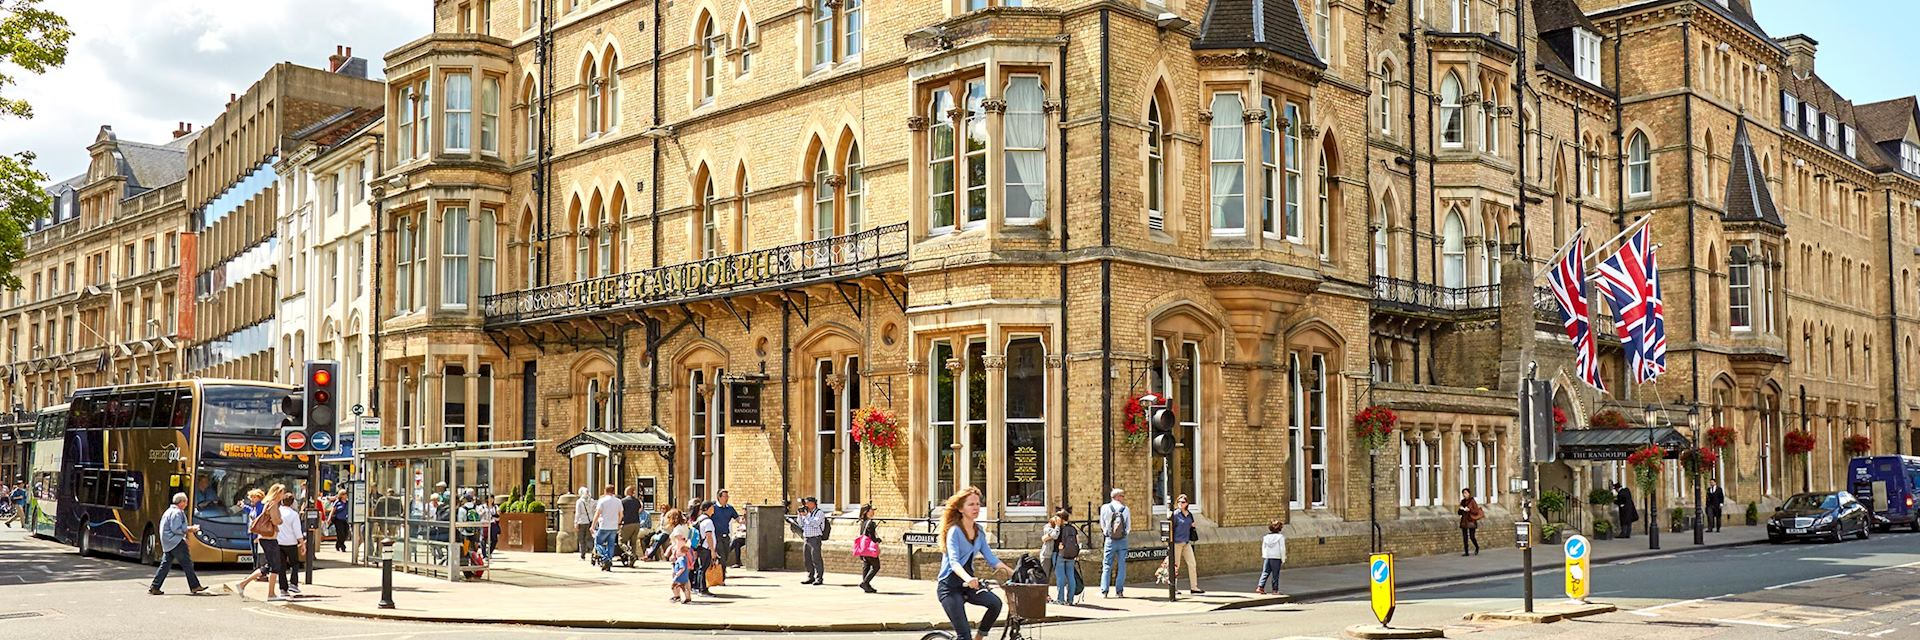 Macdonald Randolph Hotel, Oxford